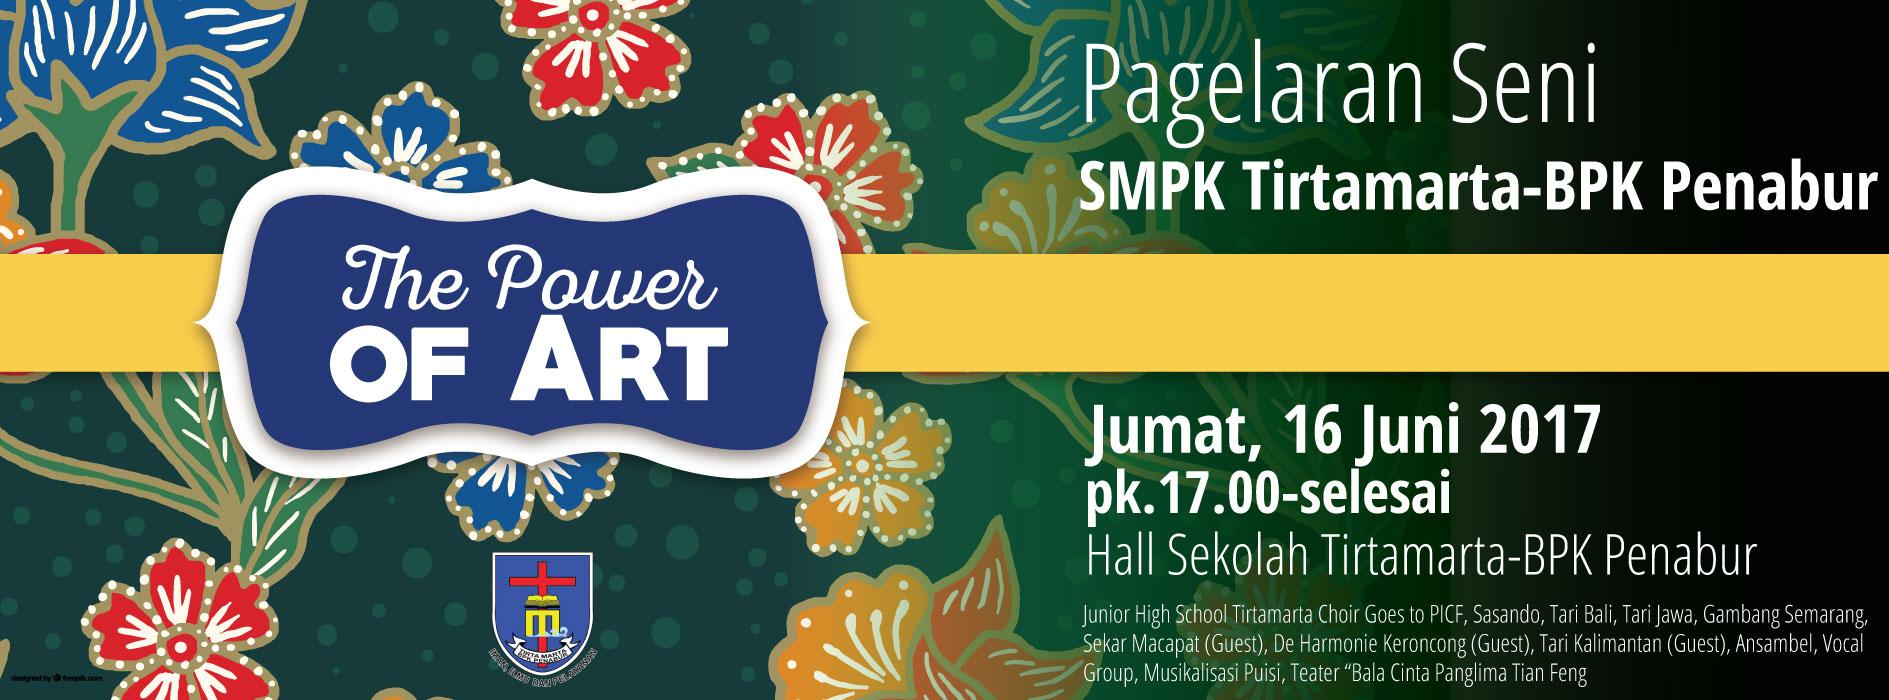 Web-banner-Pagelaran-Seni-SMPK-TM-PI-Juni-2017